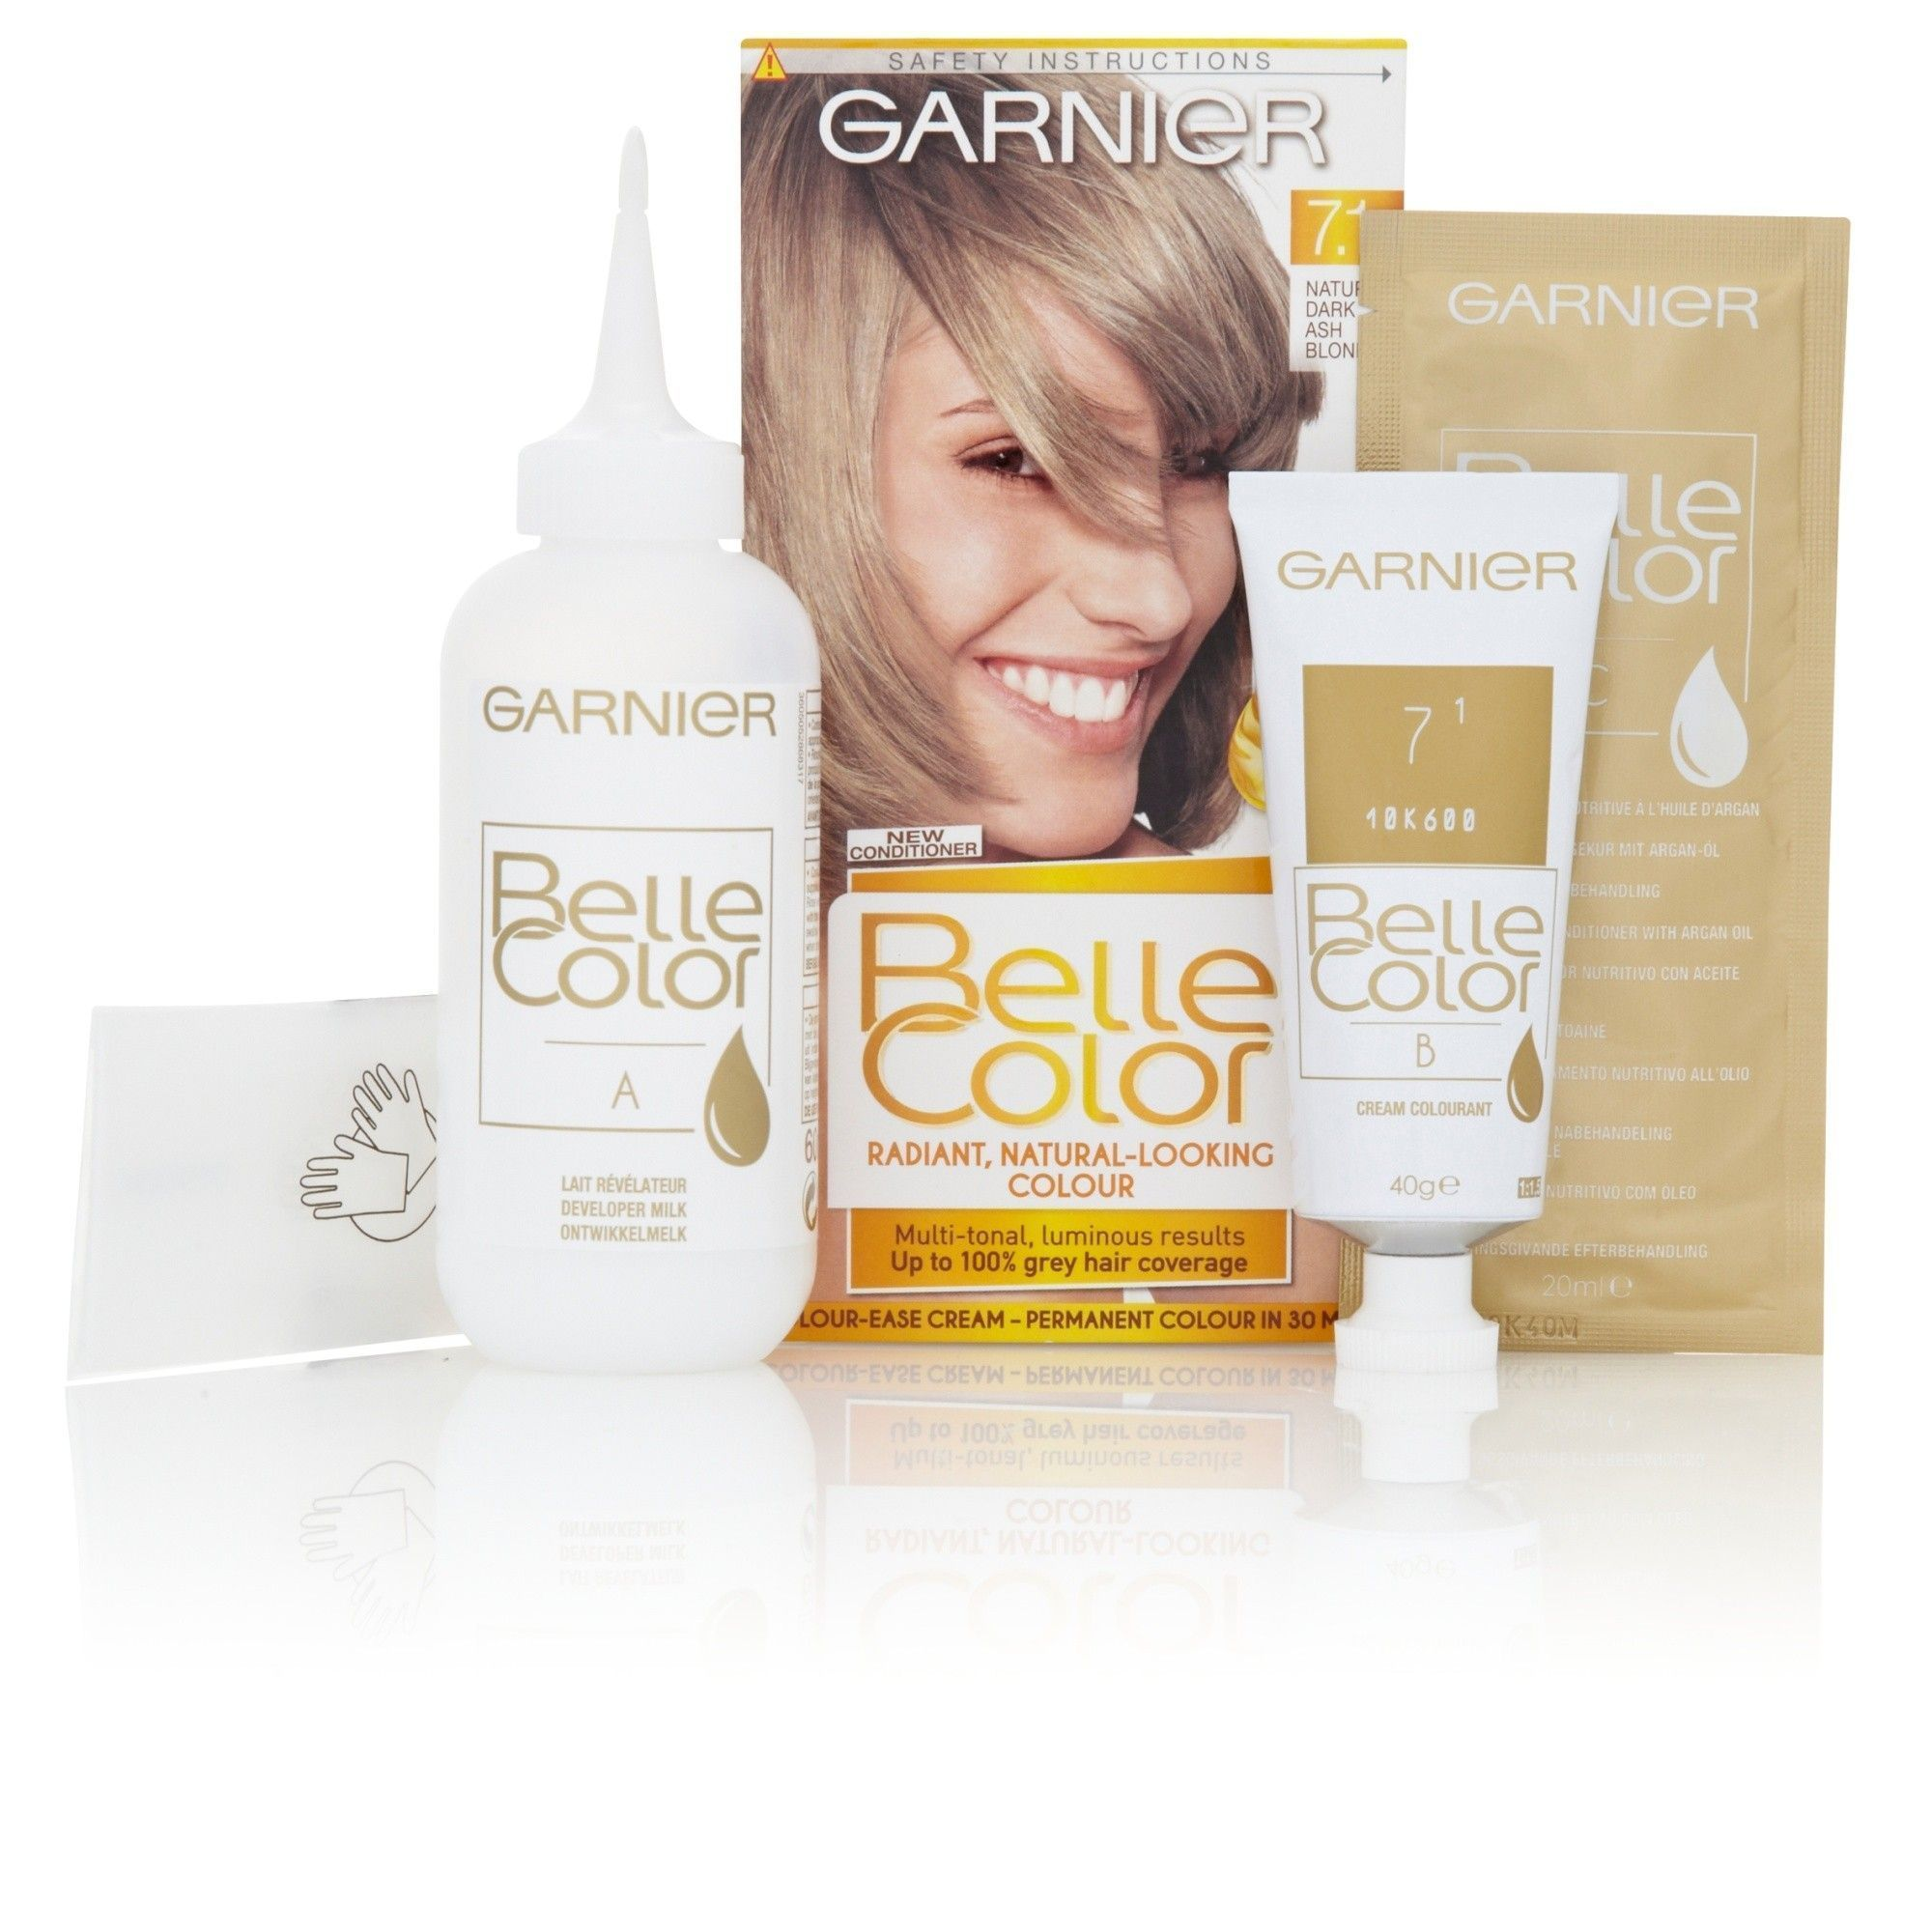 Garnier Belle Colour 7 1 Natural Dark Ash Blonde Hair Dye